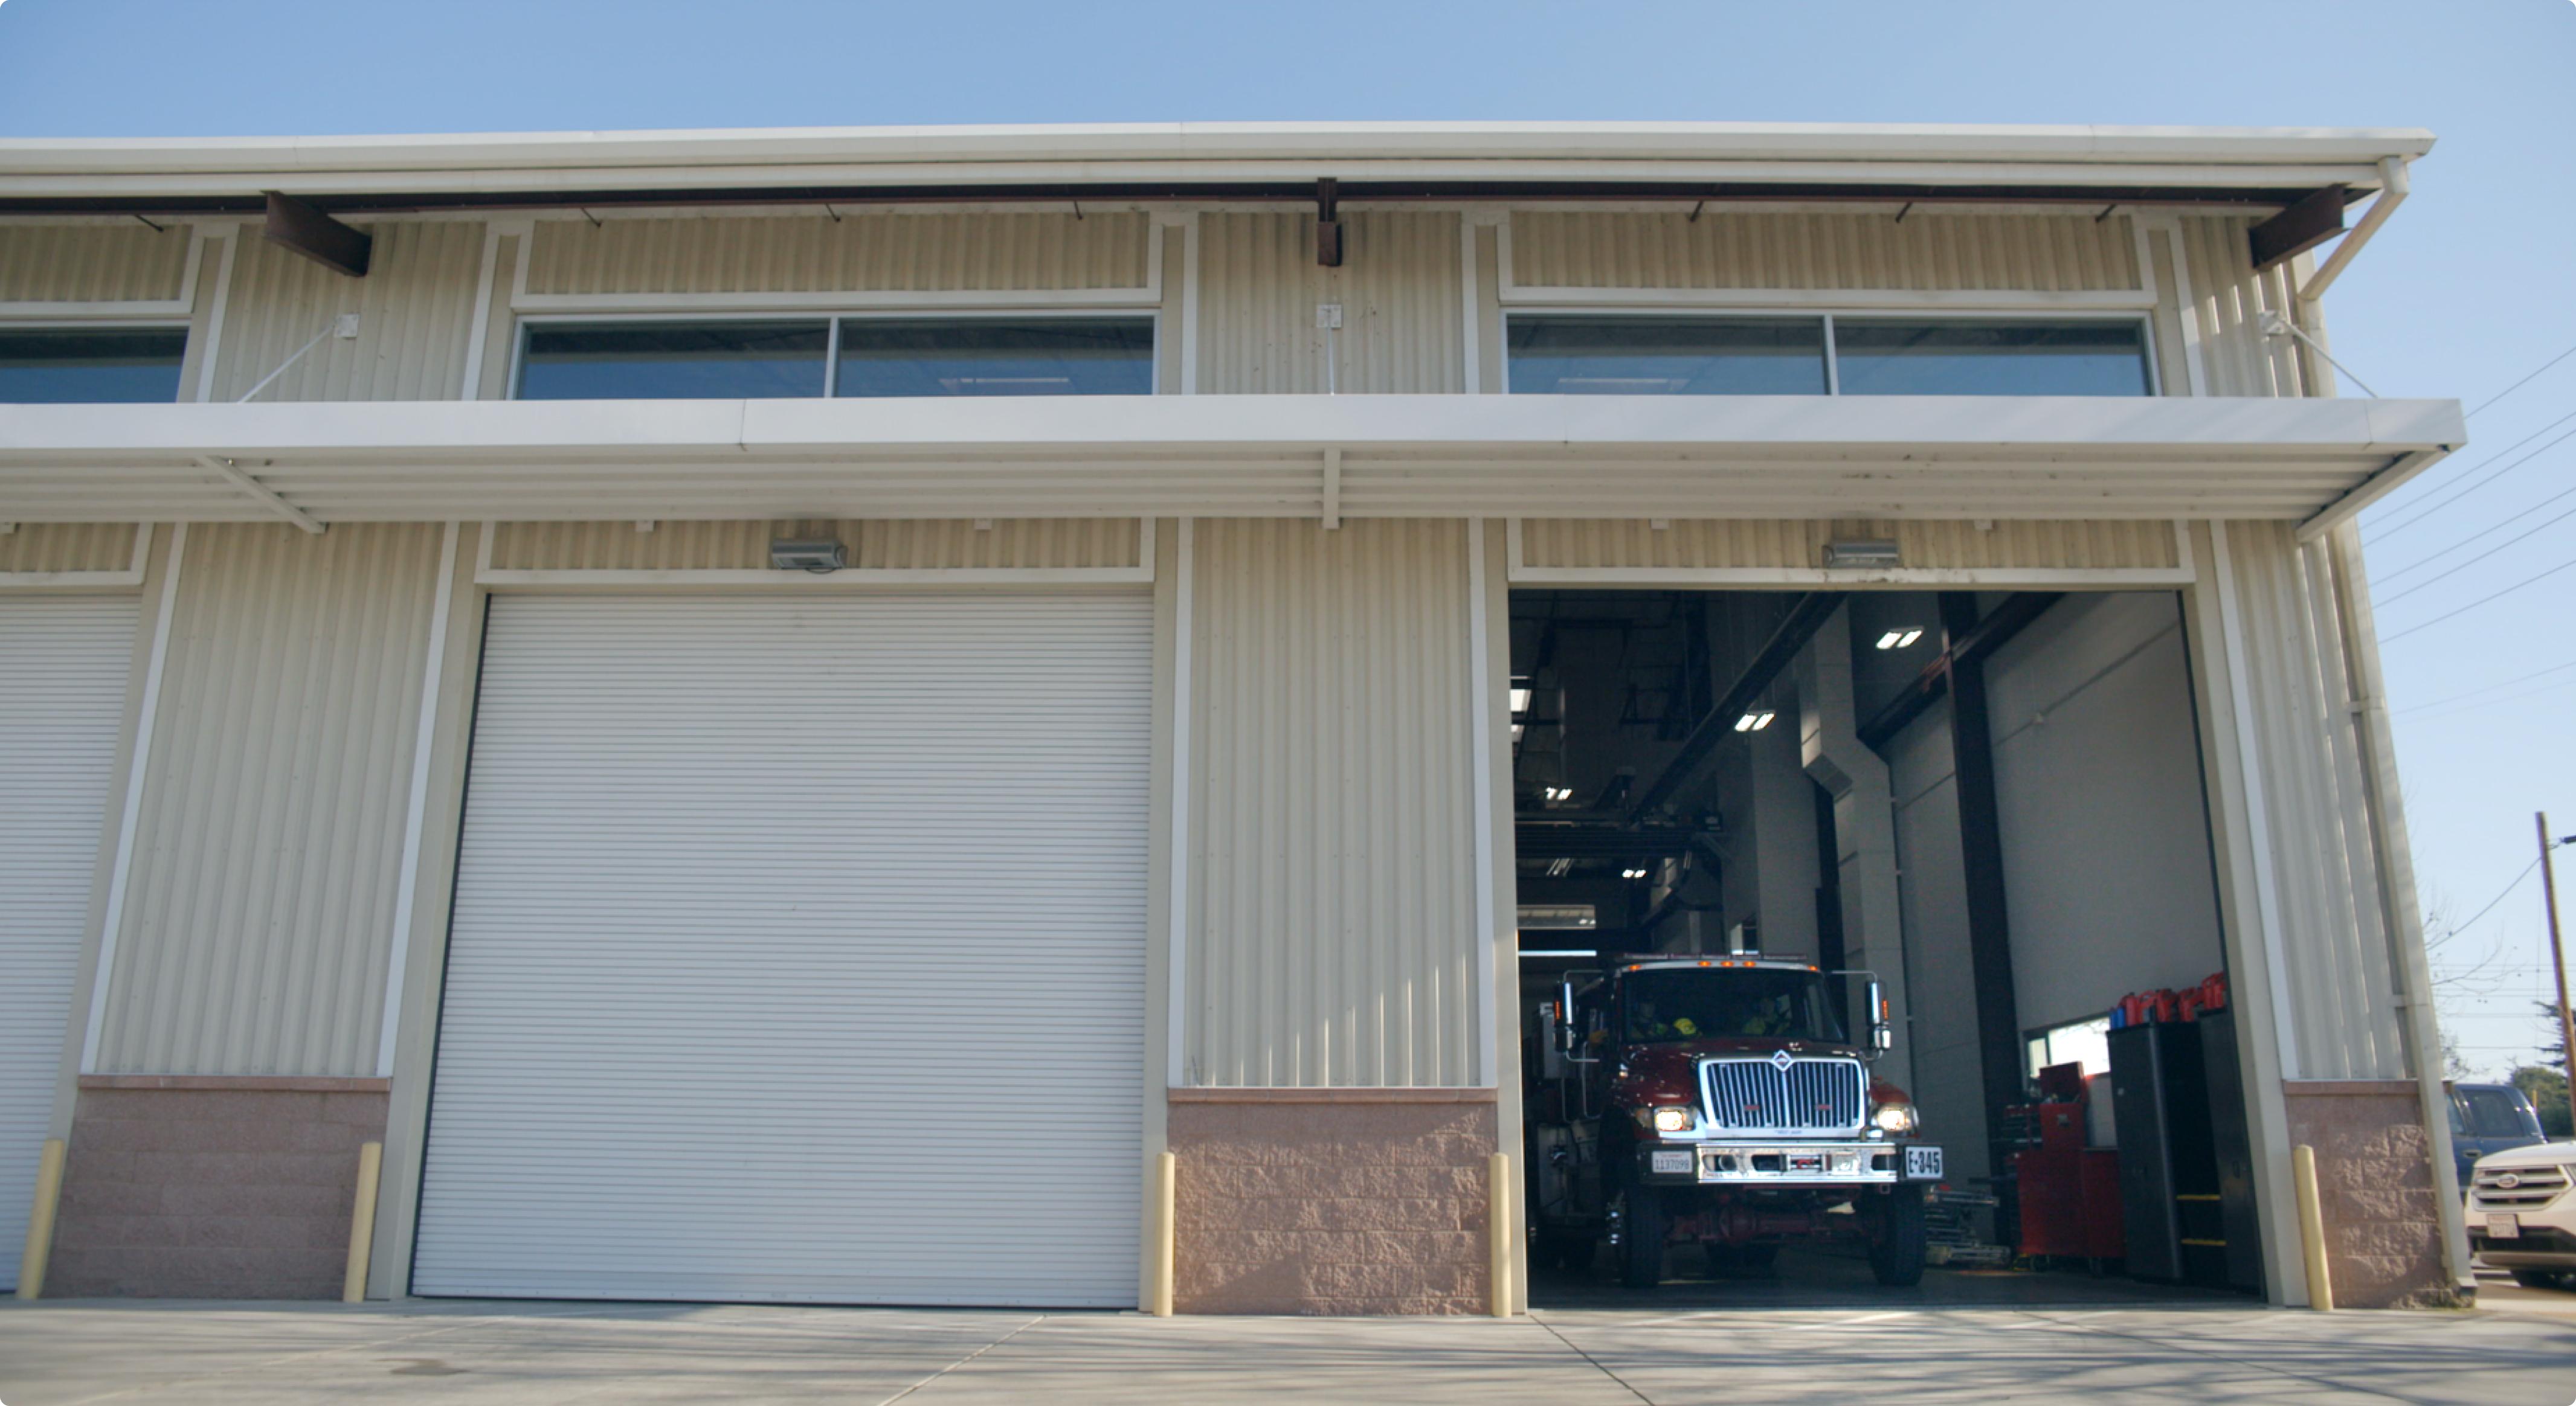 Fire department garage.